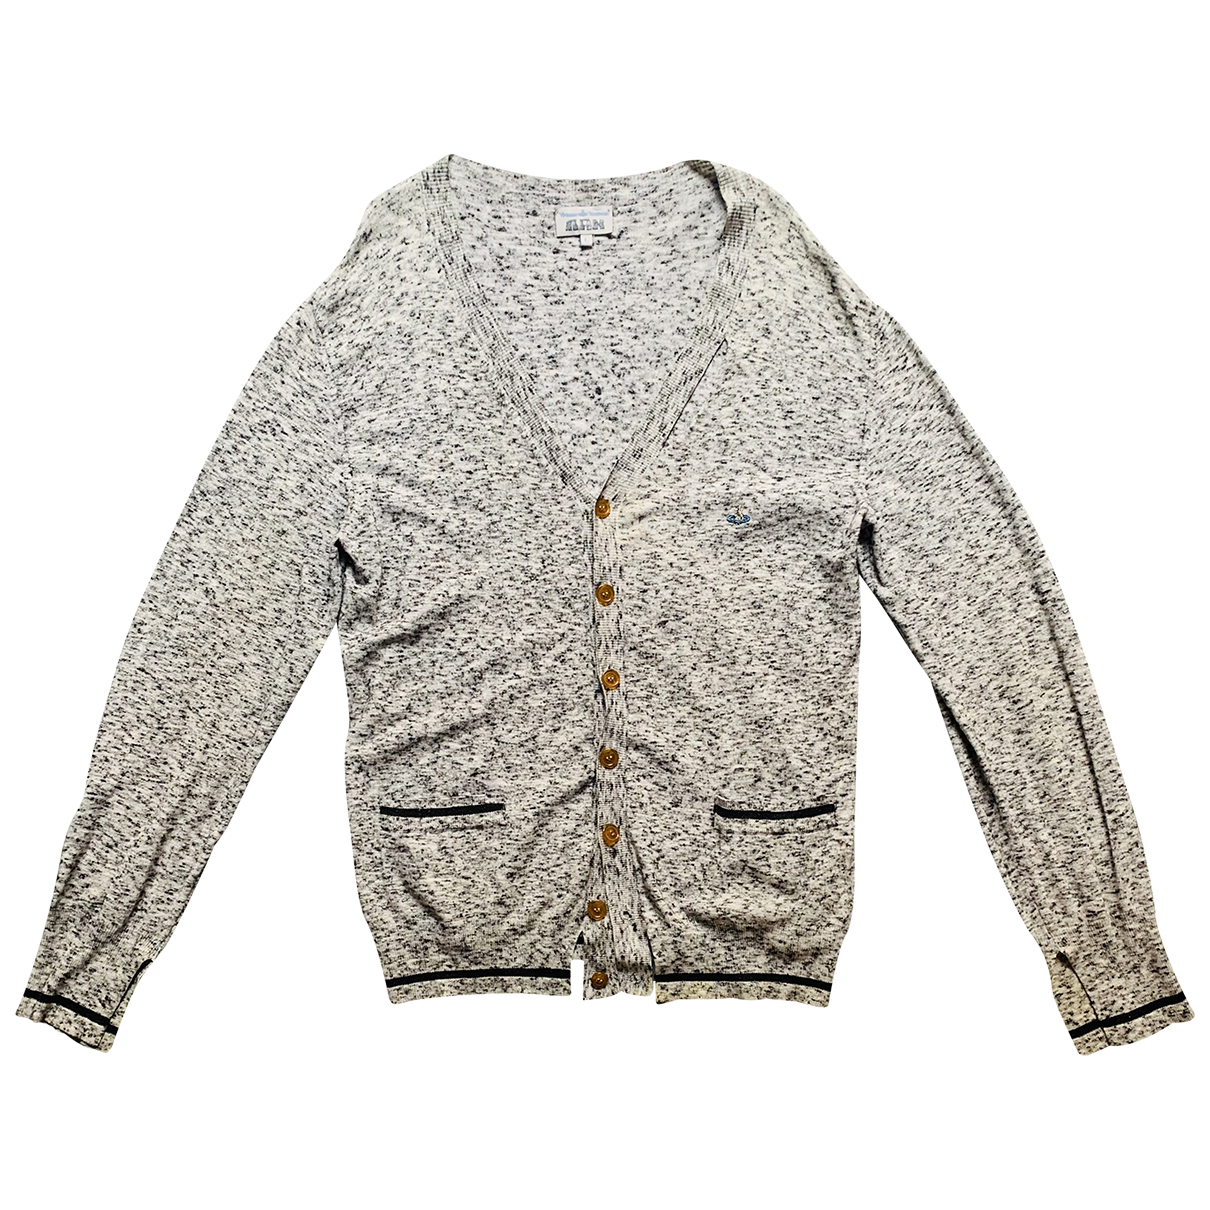 Vivienne Westwood N Grey Knitwear & Sweatshirts for Men L International